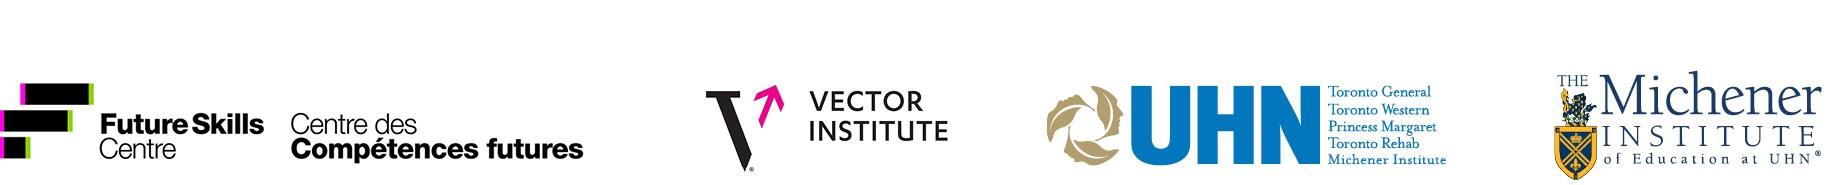 FutureSkills-VI-Michener Logos